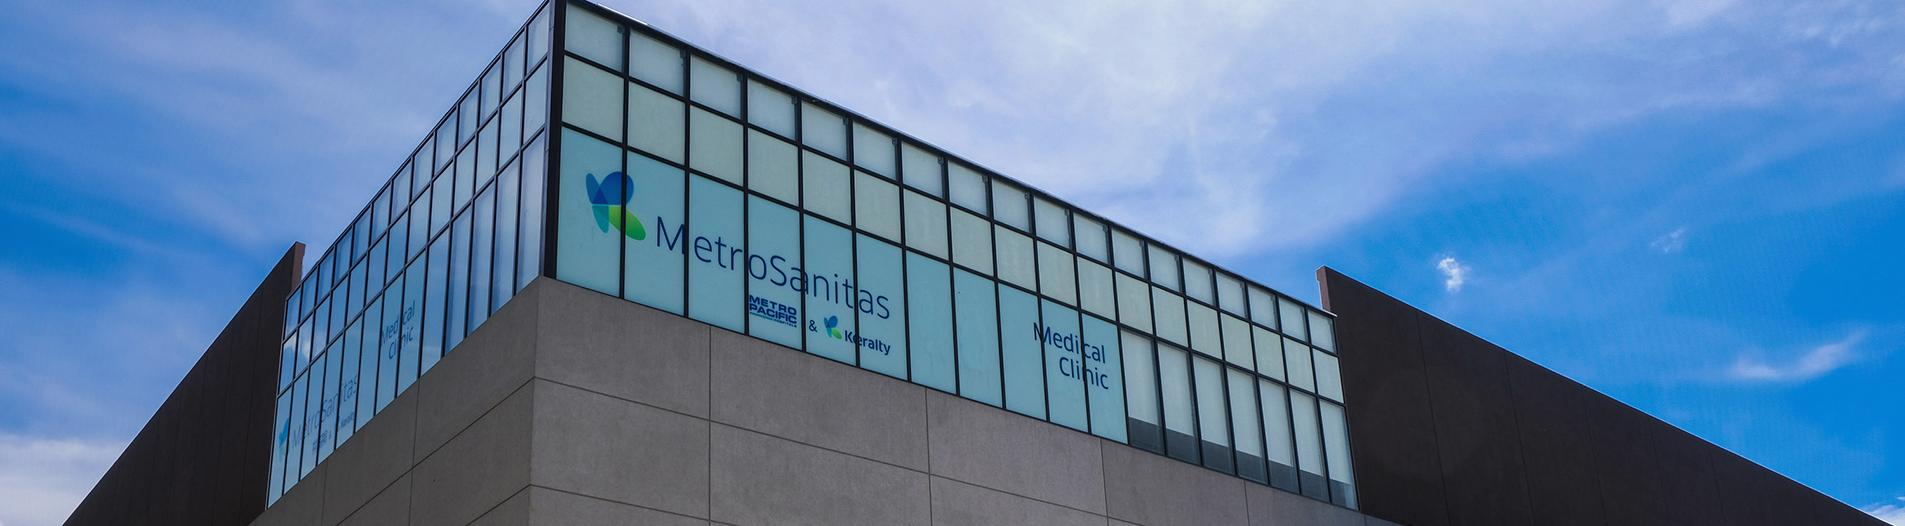 MetroSanitas Corporation